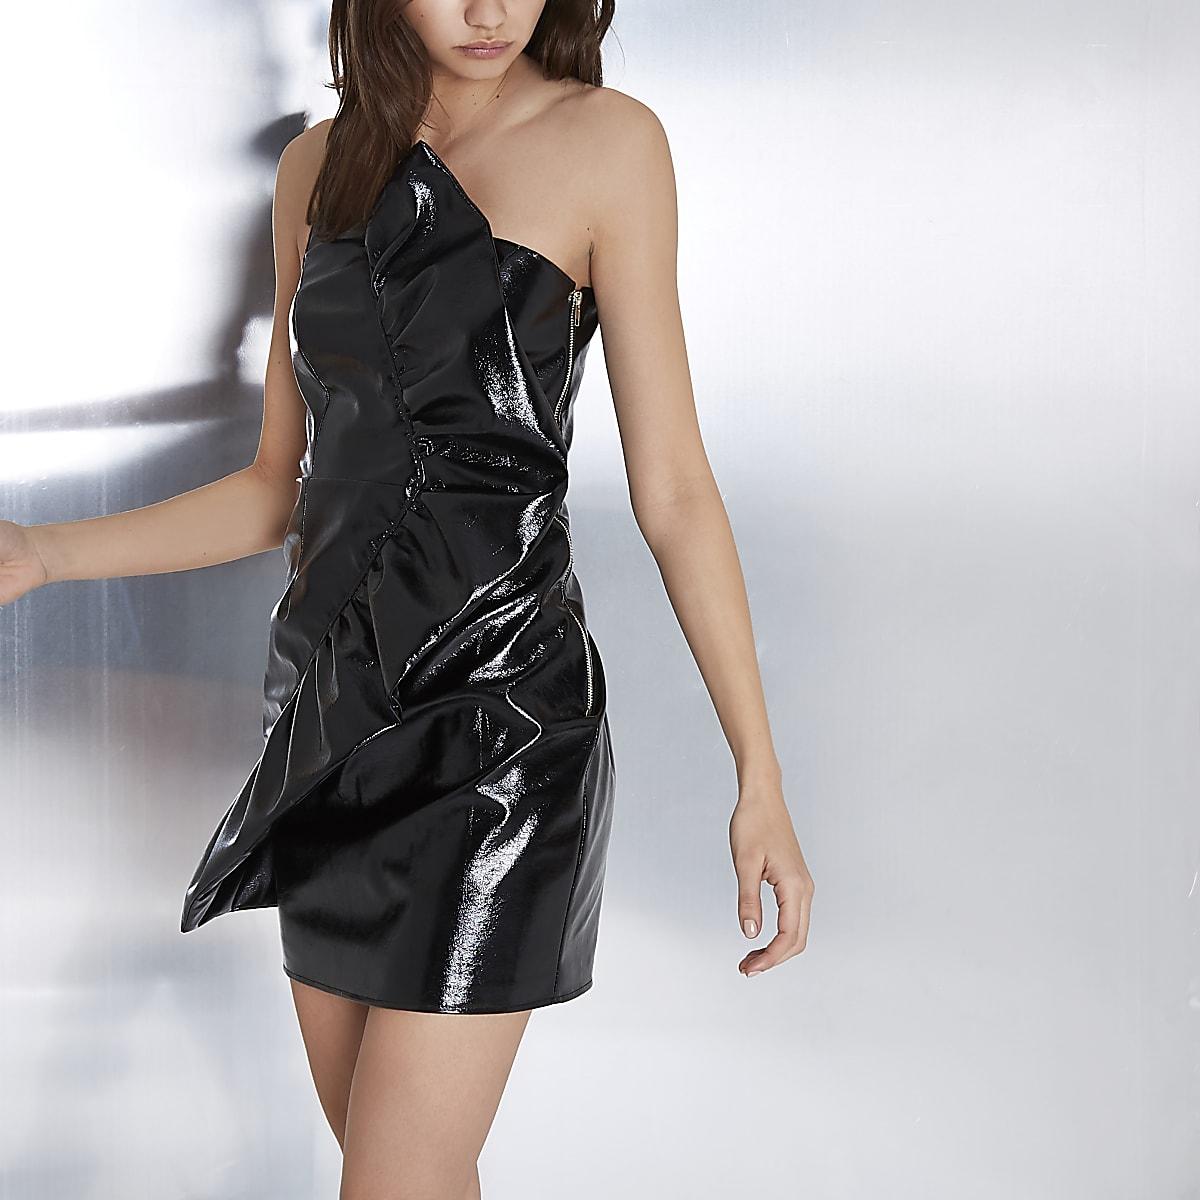 Black vinyl frill one shoulder bodycon dress